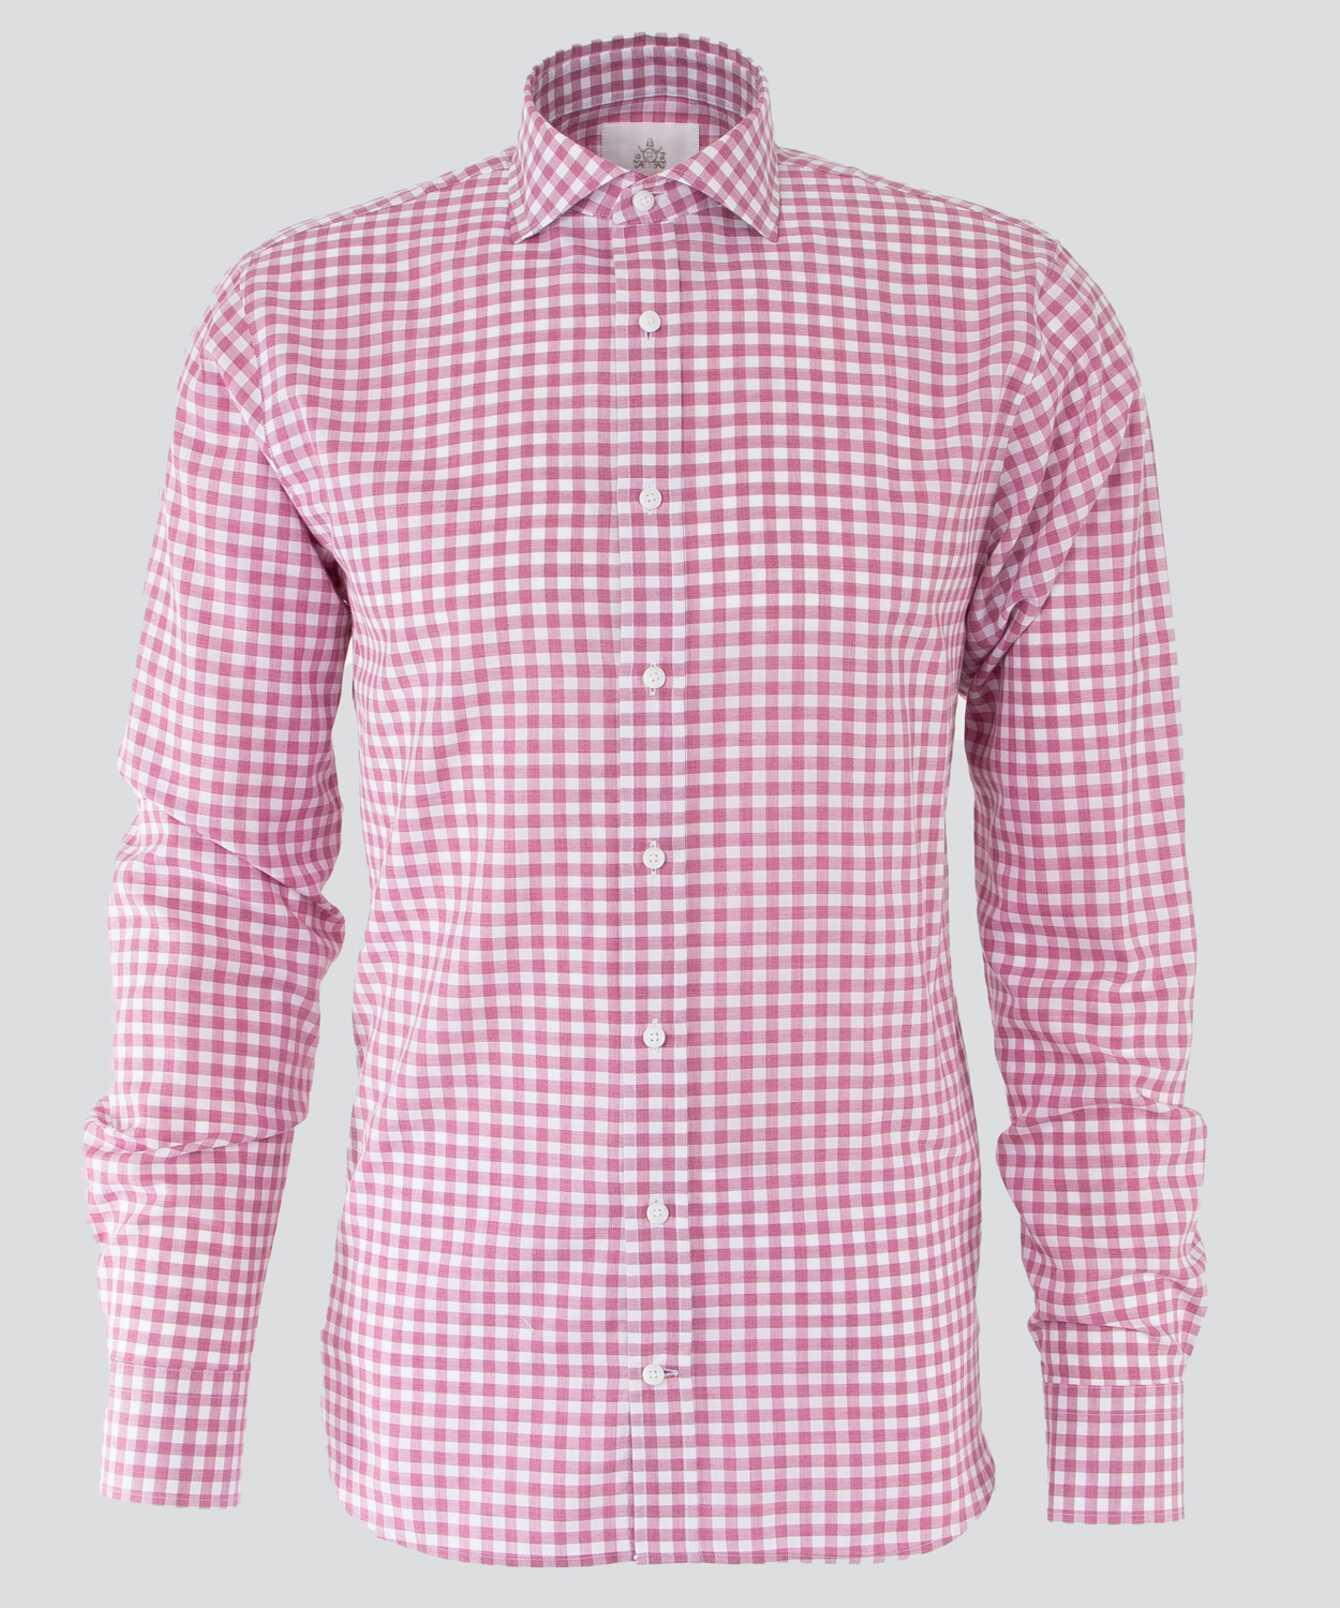 Shirt Charleston Pink Extra Long Sleeve The Shirt Factory